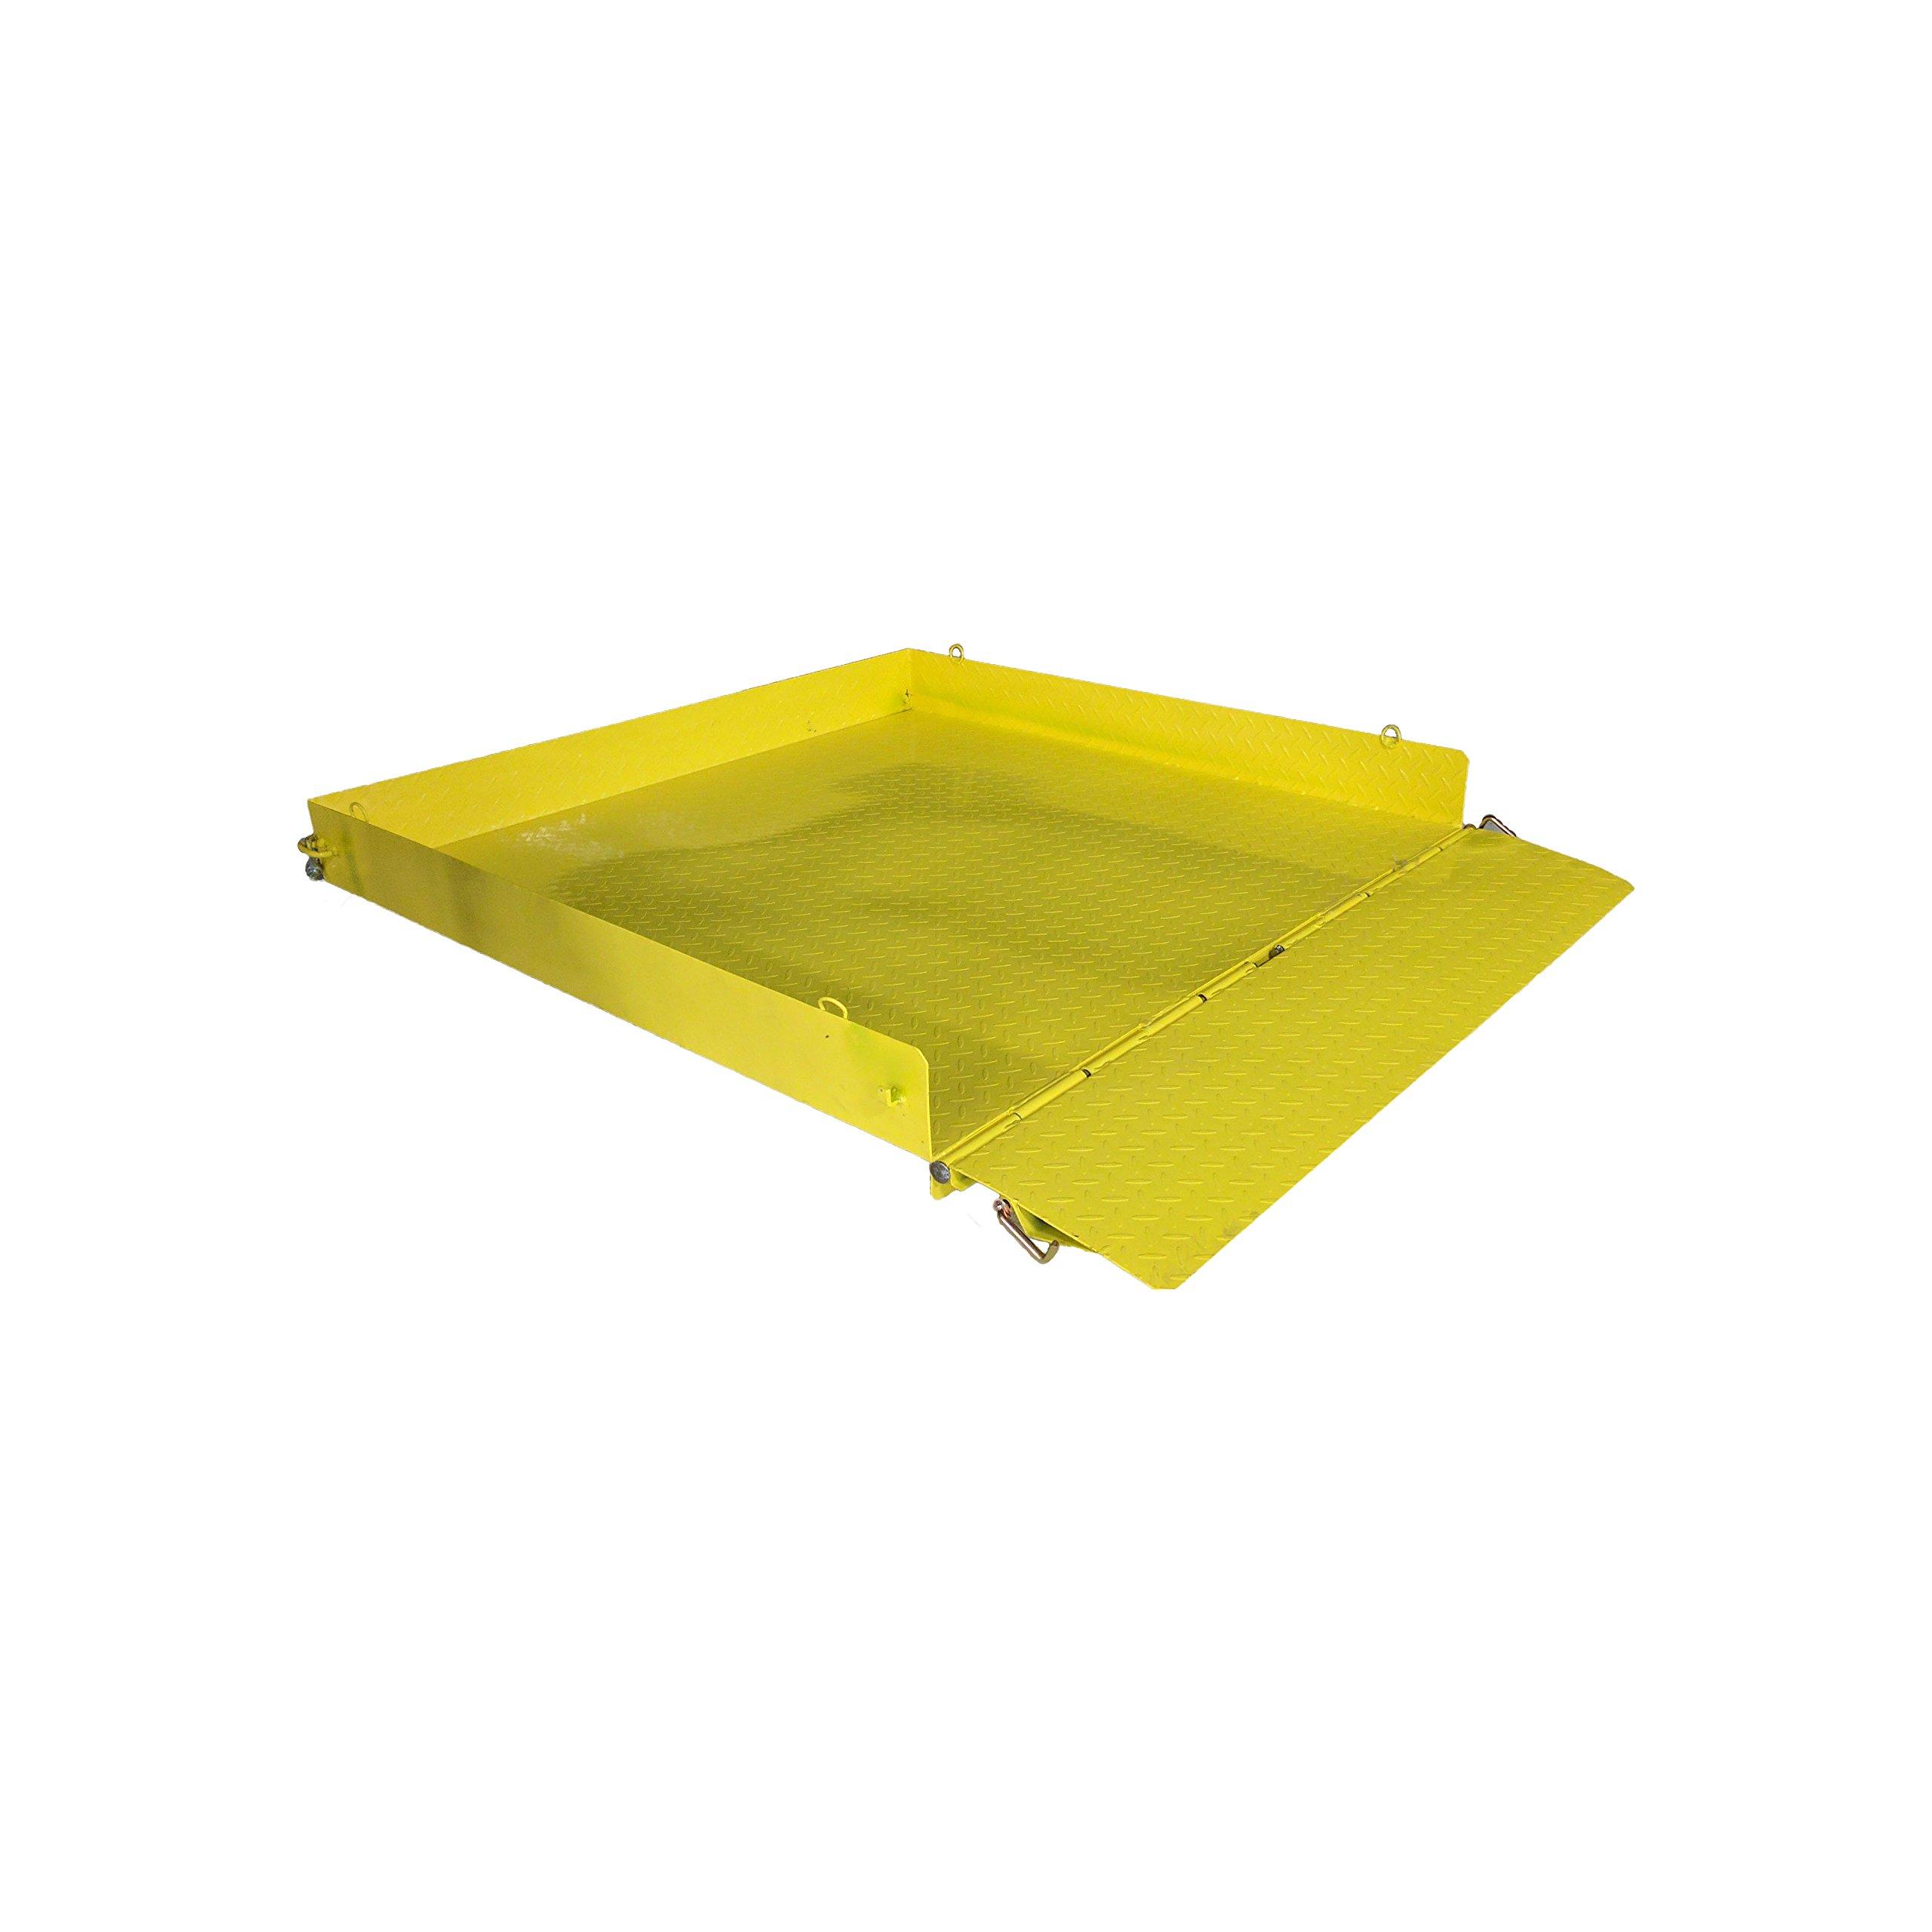 54'' x 54'' Titan Pallet Fork Loading Work Platform - 2,000 LB Capacity